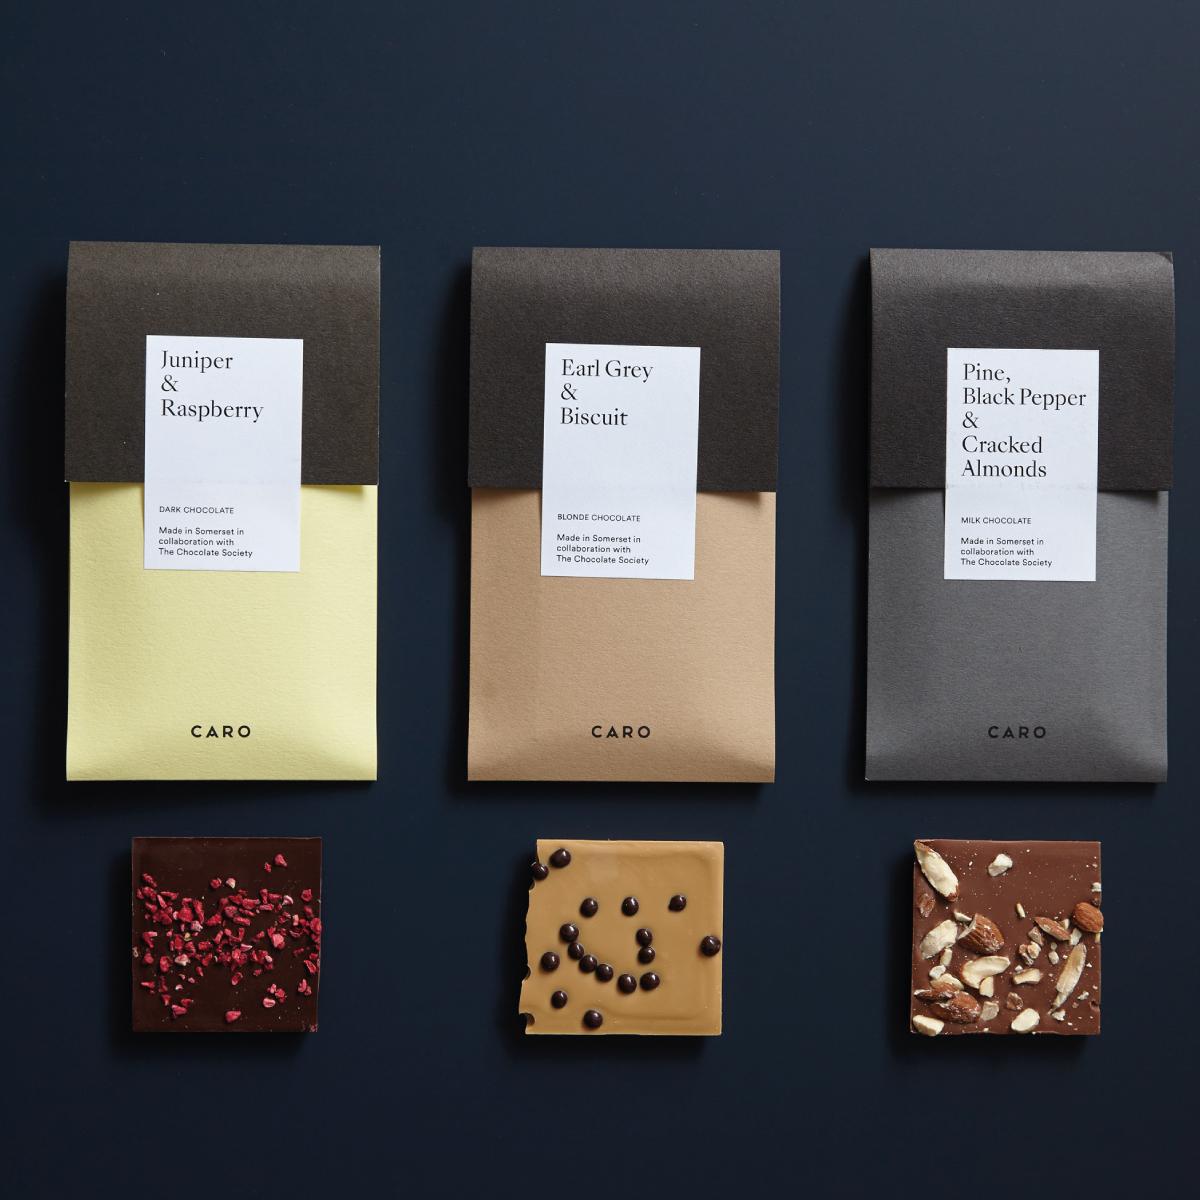 Caro-Chocolate-Mix